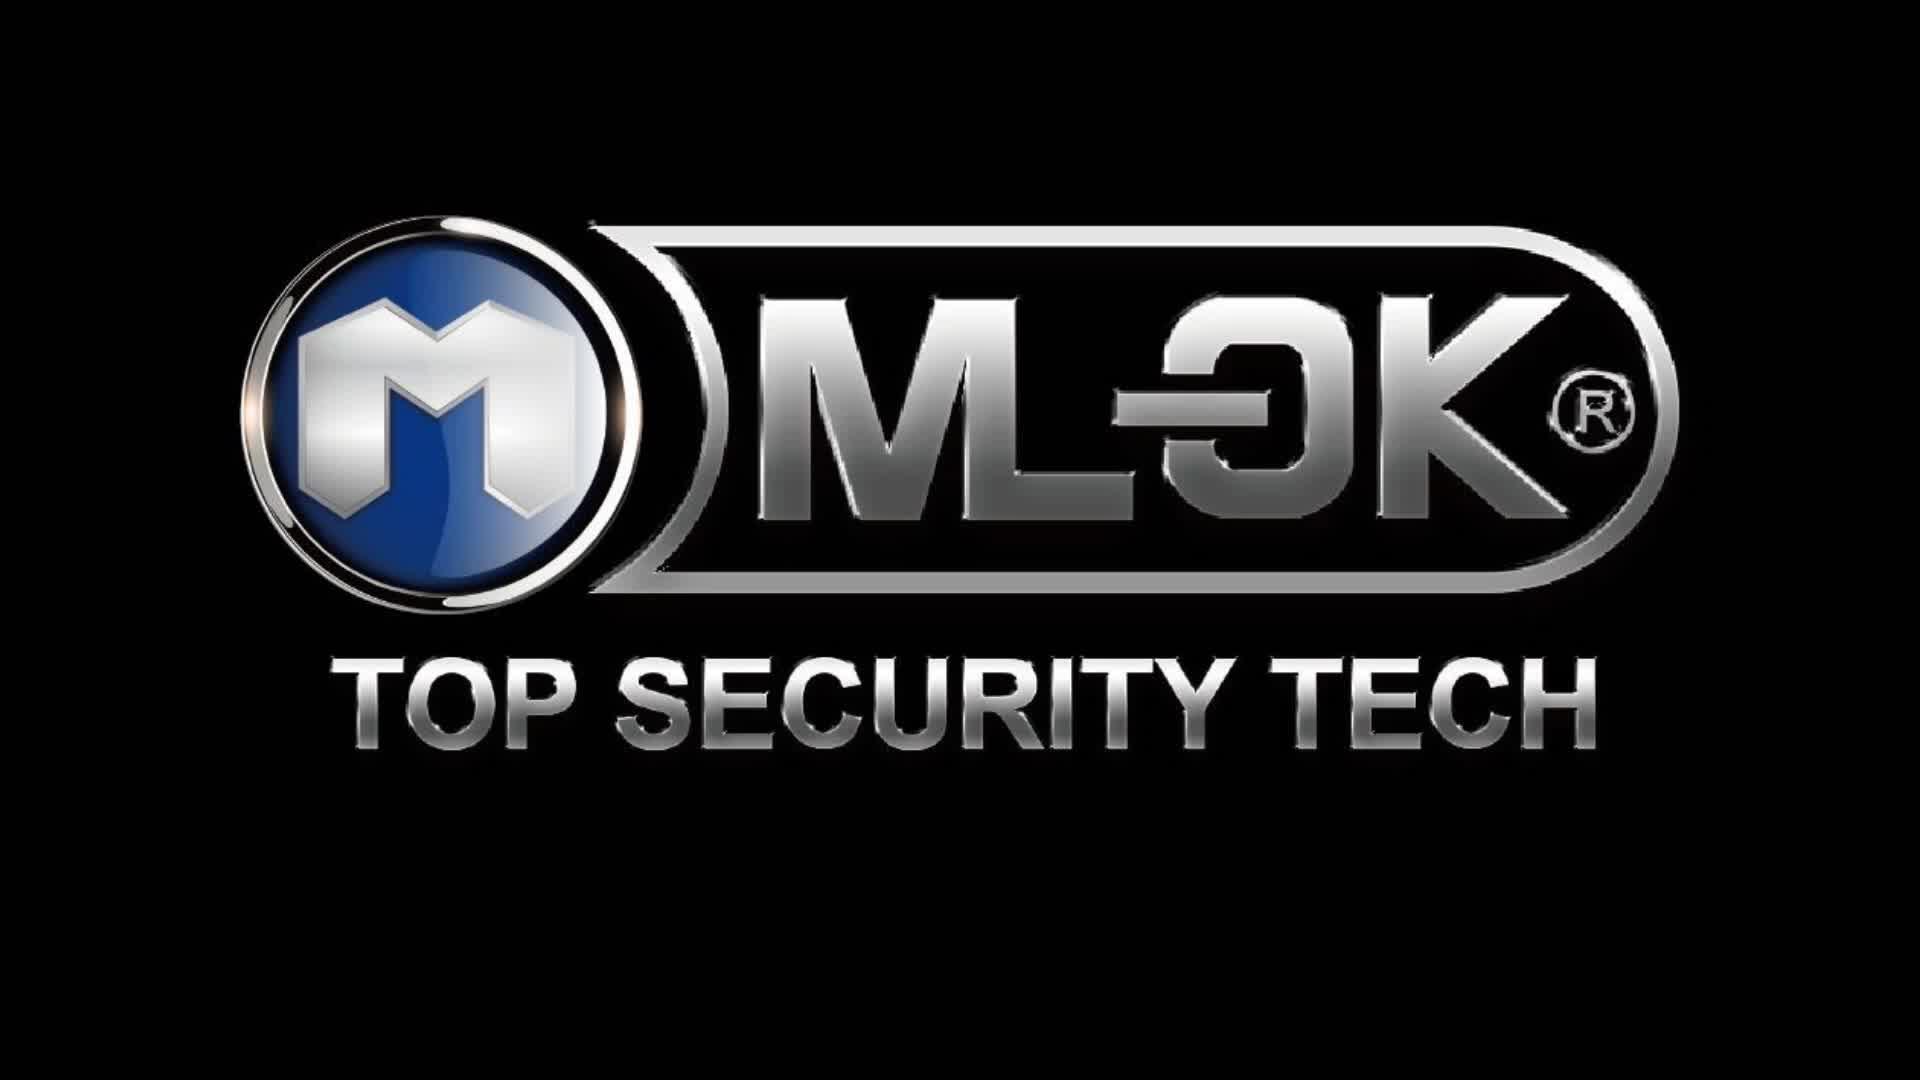 MOK Bedroom handle hot selling door knob locks with anti corrosion door lever